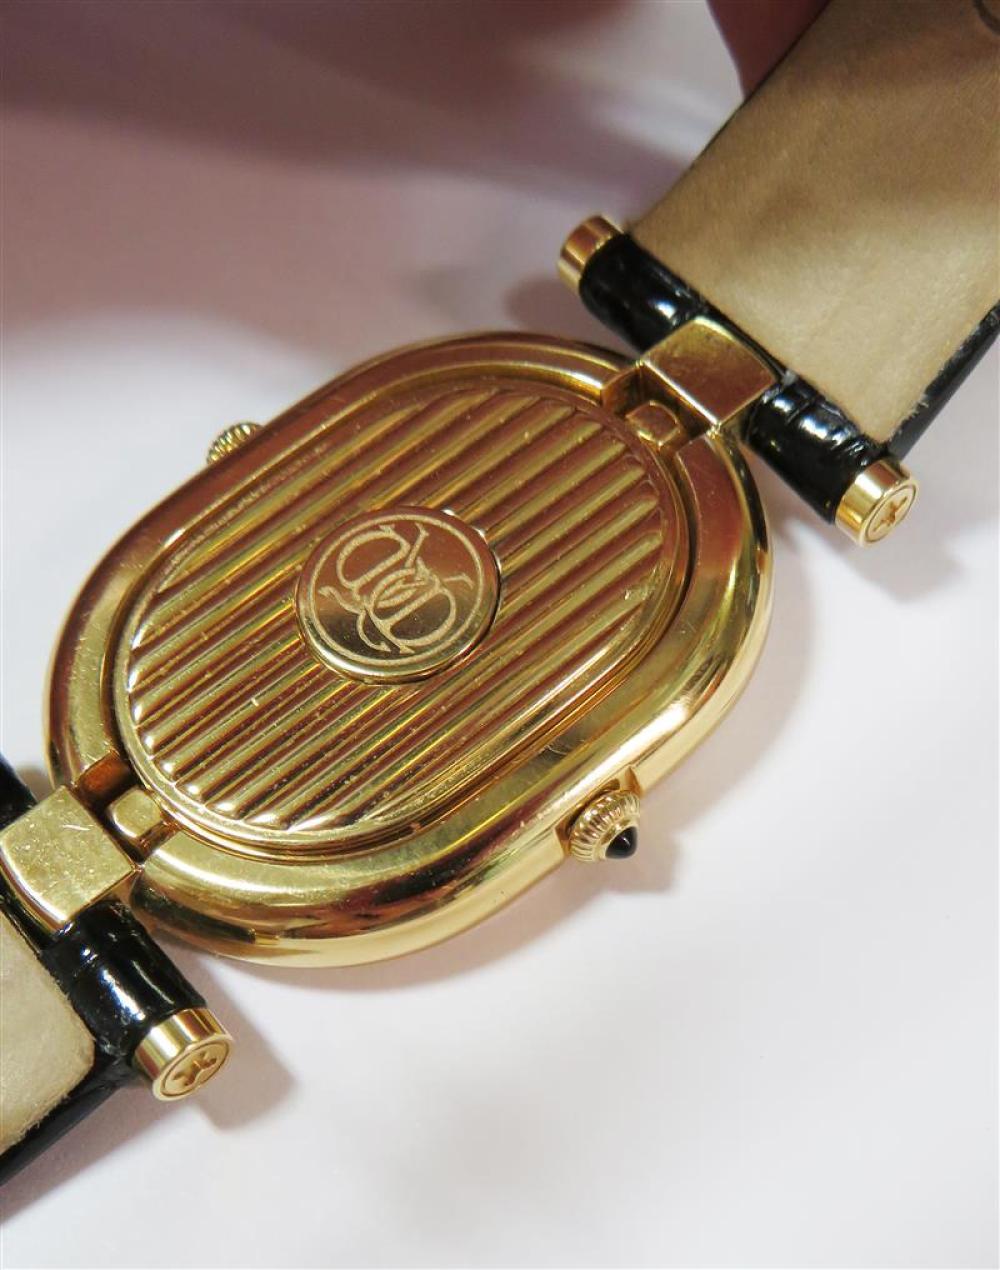 Seiko Credor diamond and gold wristwatch, retailed by Wako